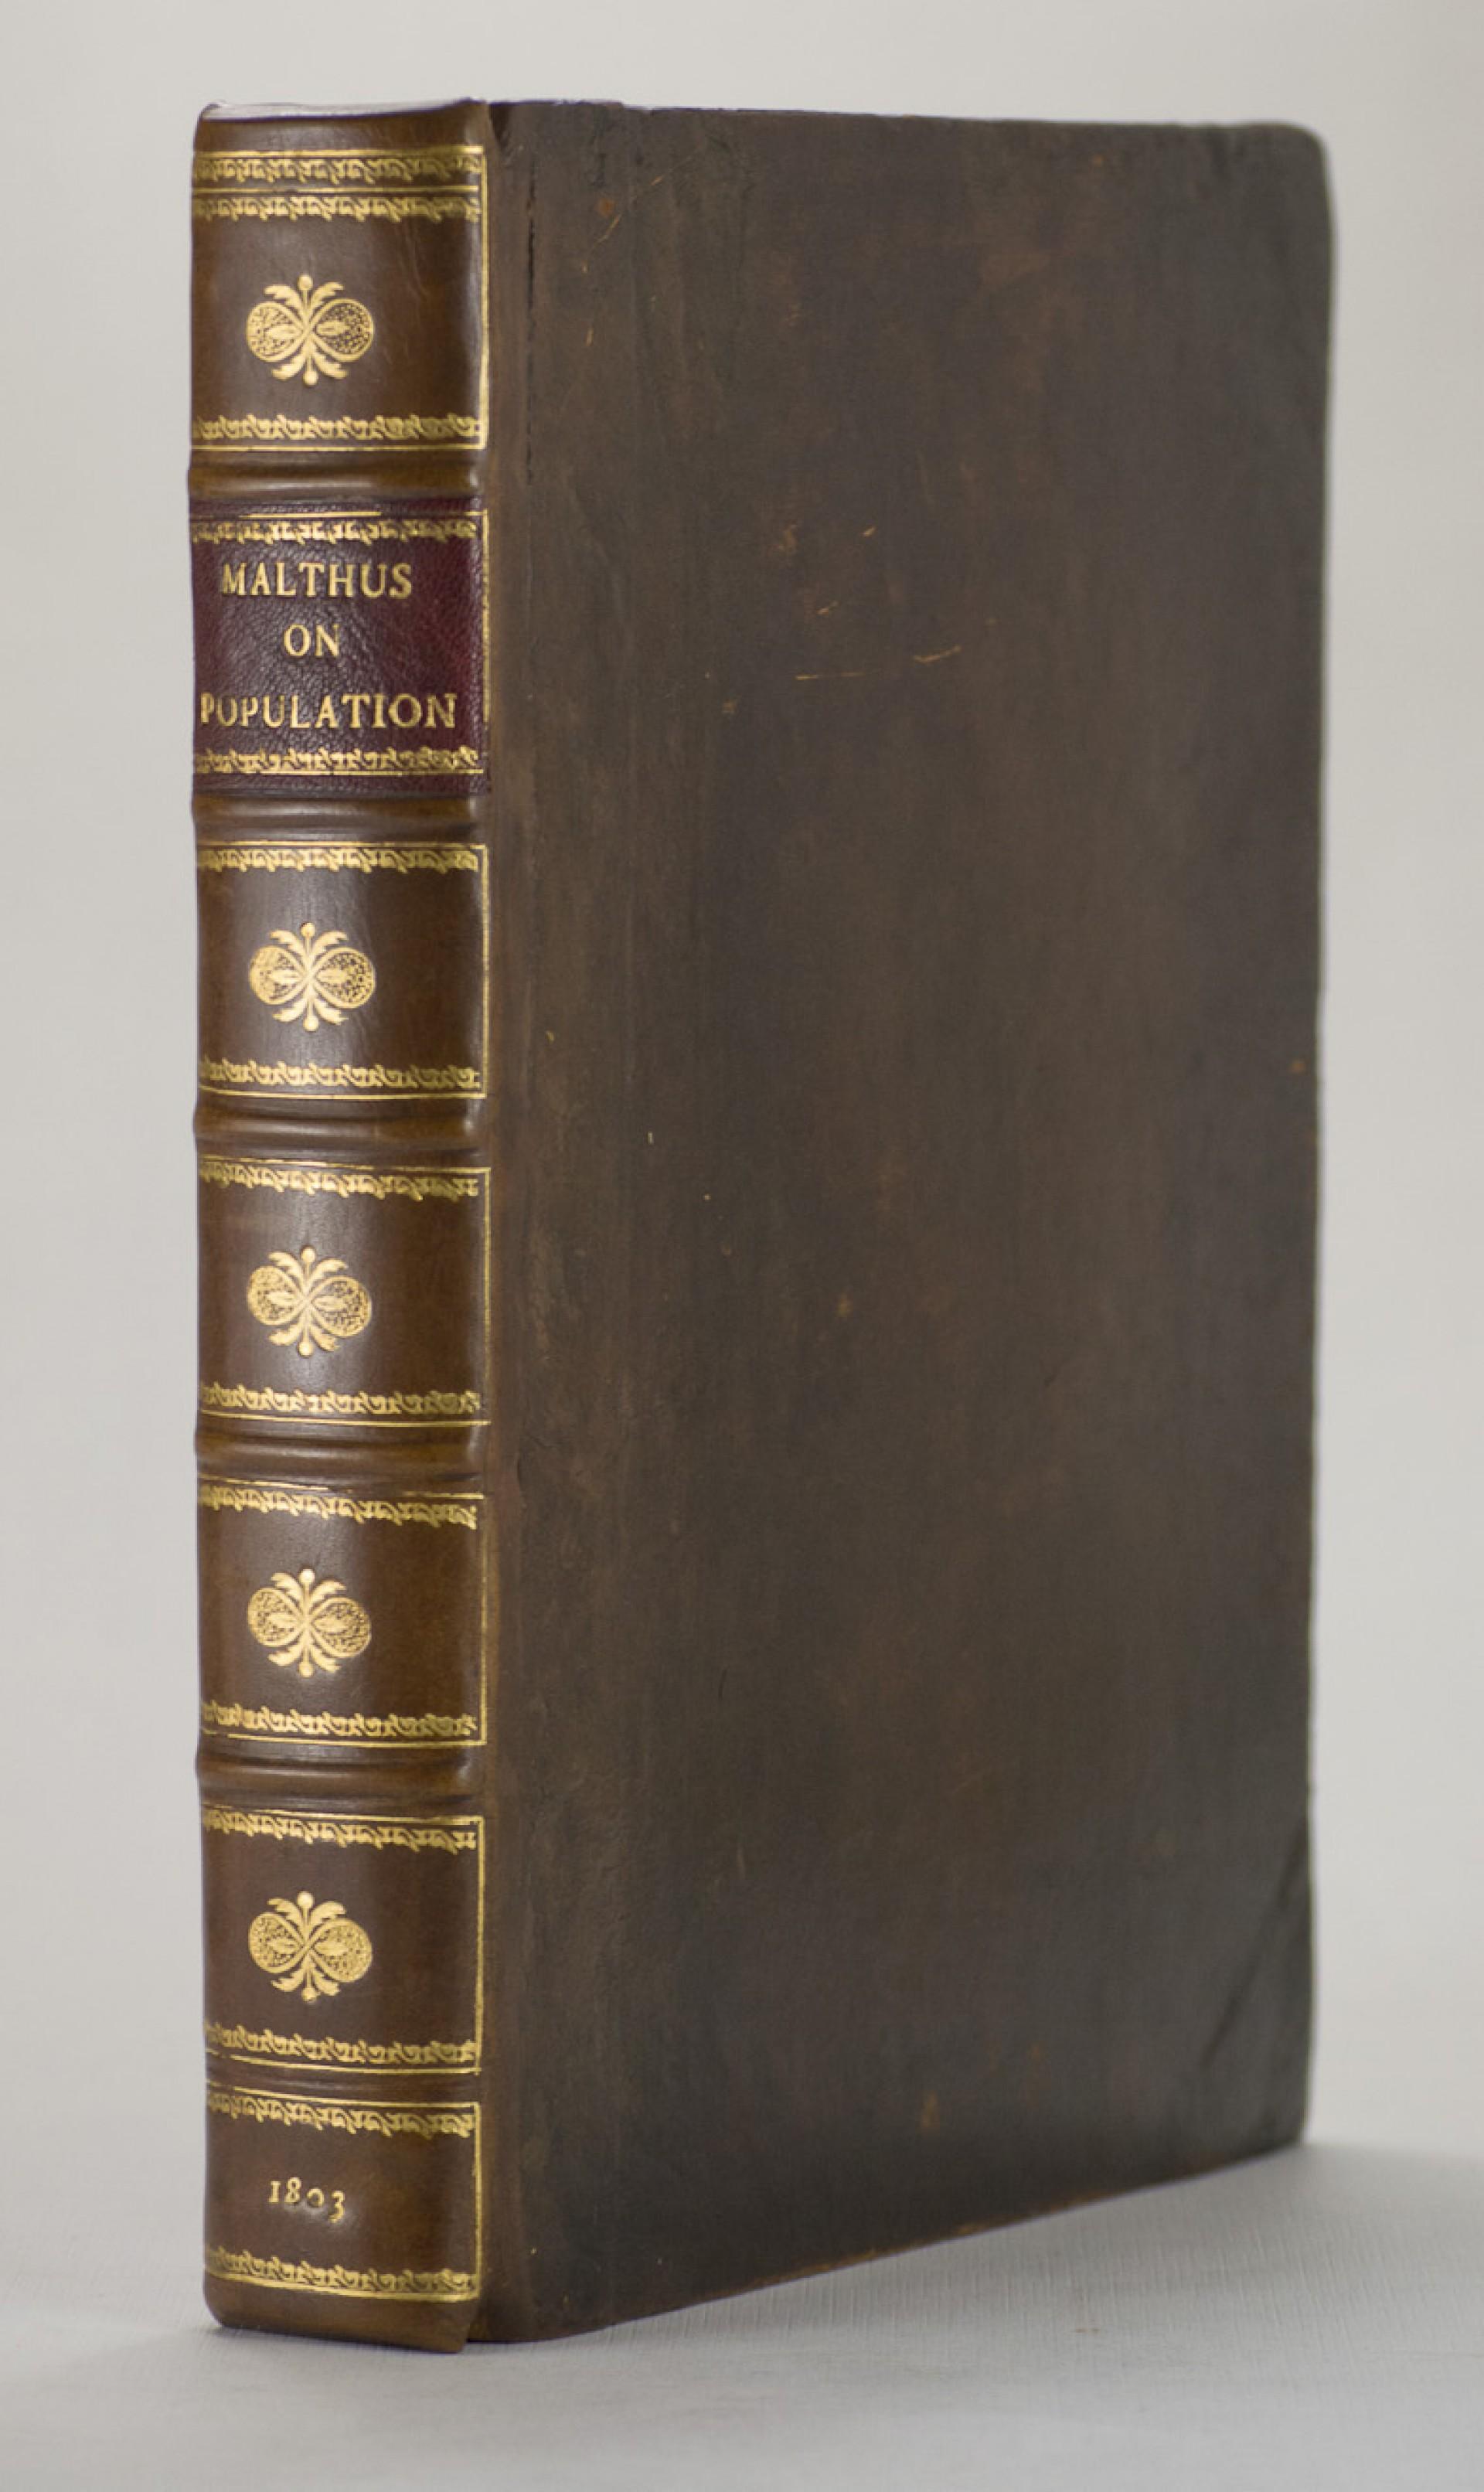 014 Thomas Malthus Essay On The Principle Of Population 65276 1 Stupendous After Reading Malthus's Principles Darwin Got Idea That Ap Euro 1920